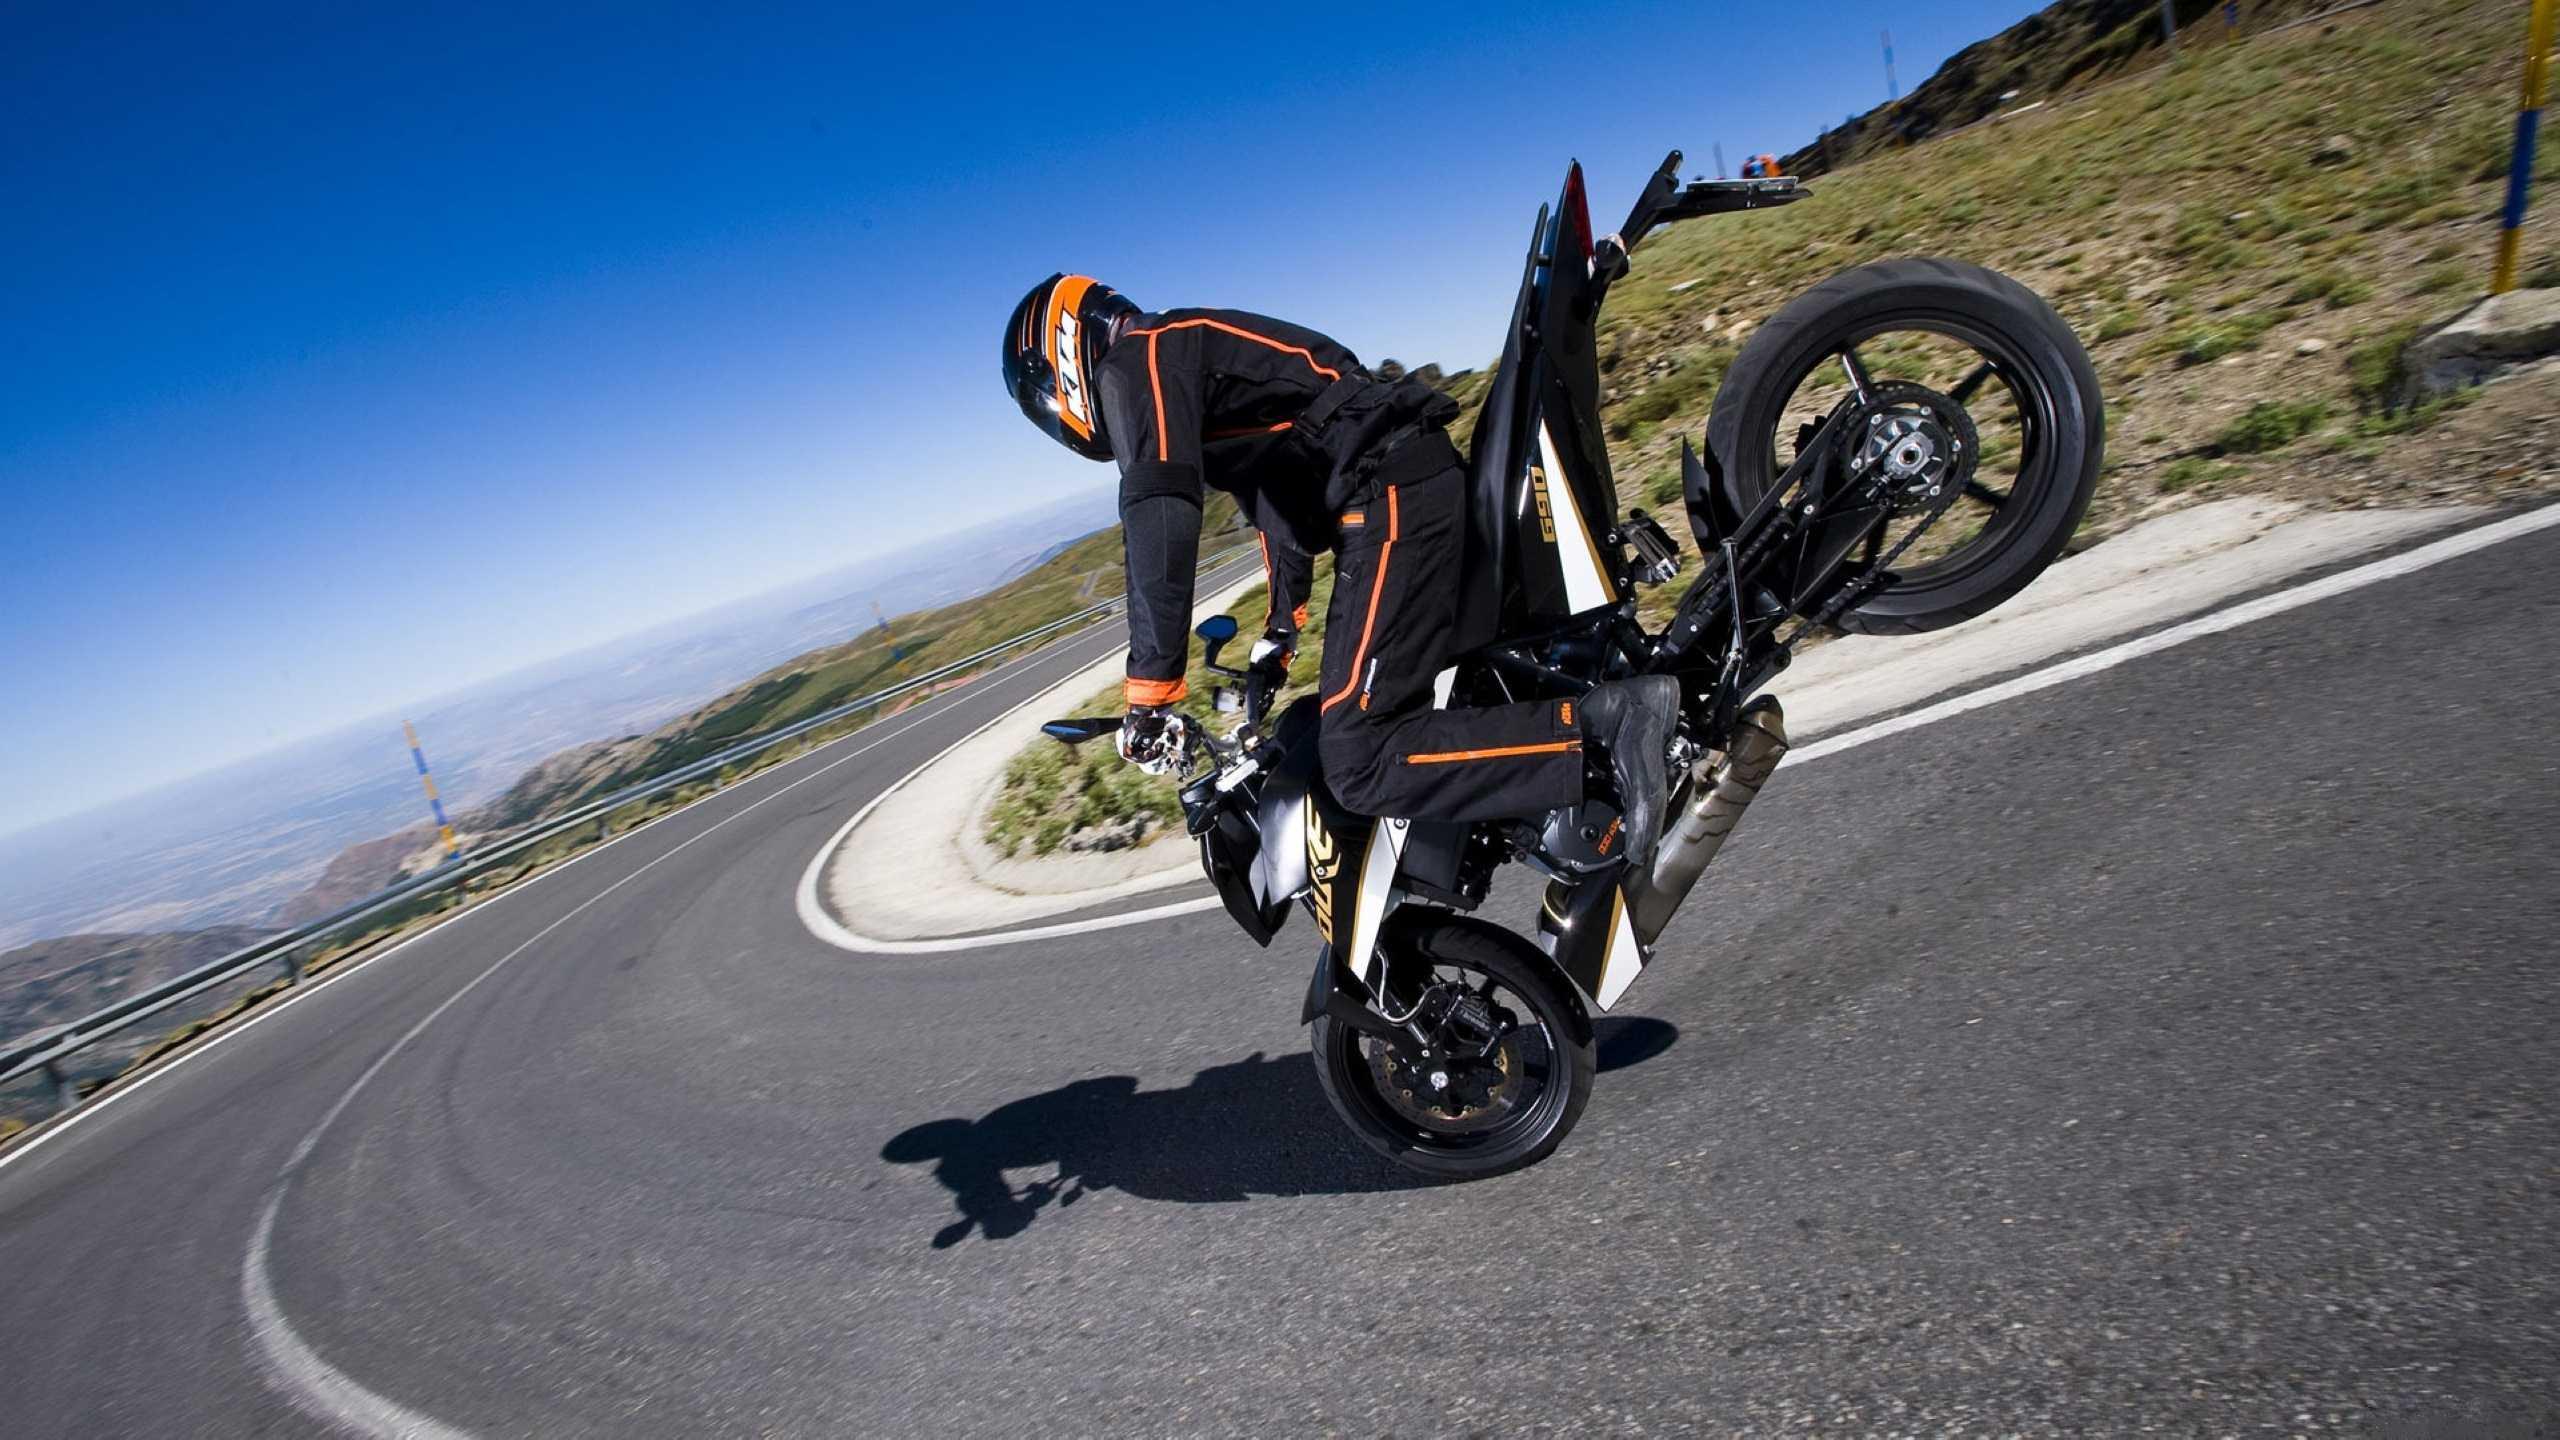 Dangerous Bike Stunt In 2017 HD Wallpapers I - Wallpaper Cave